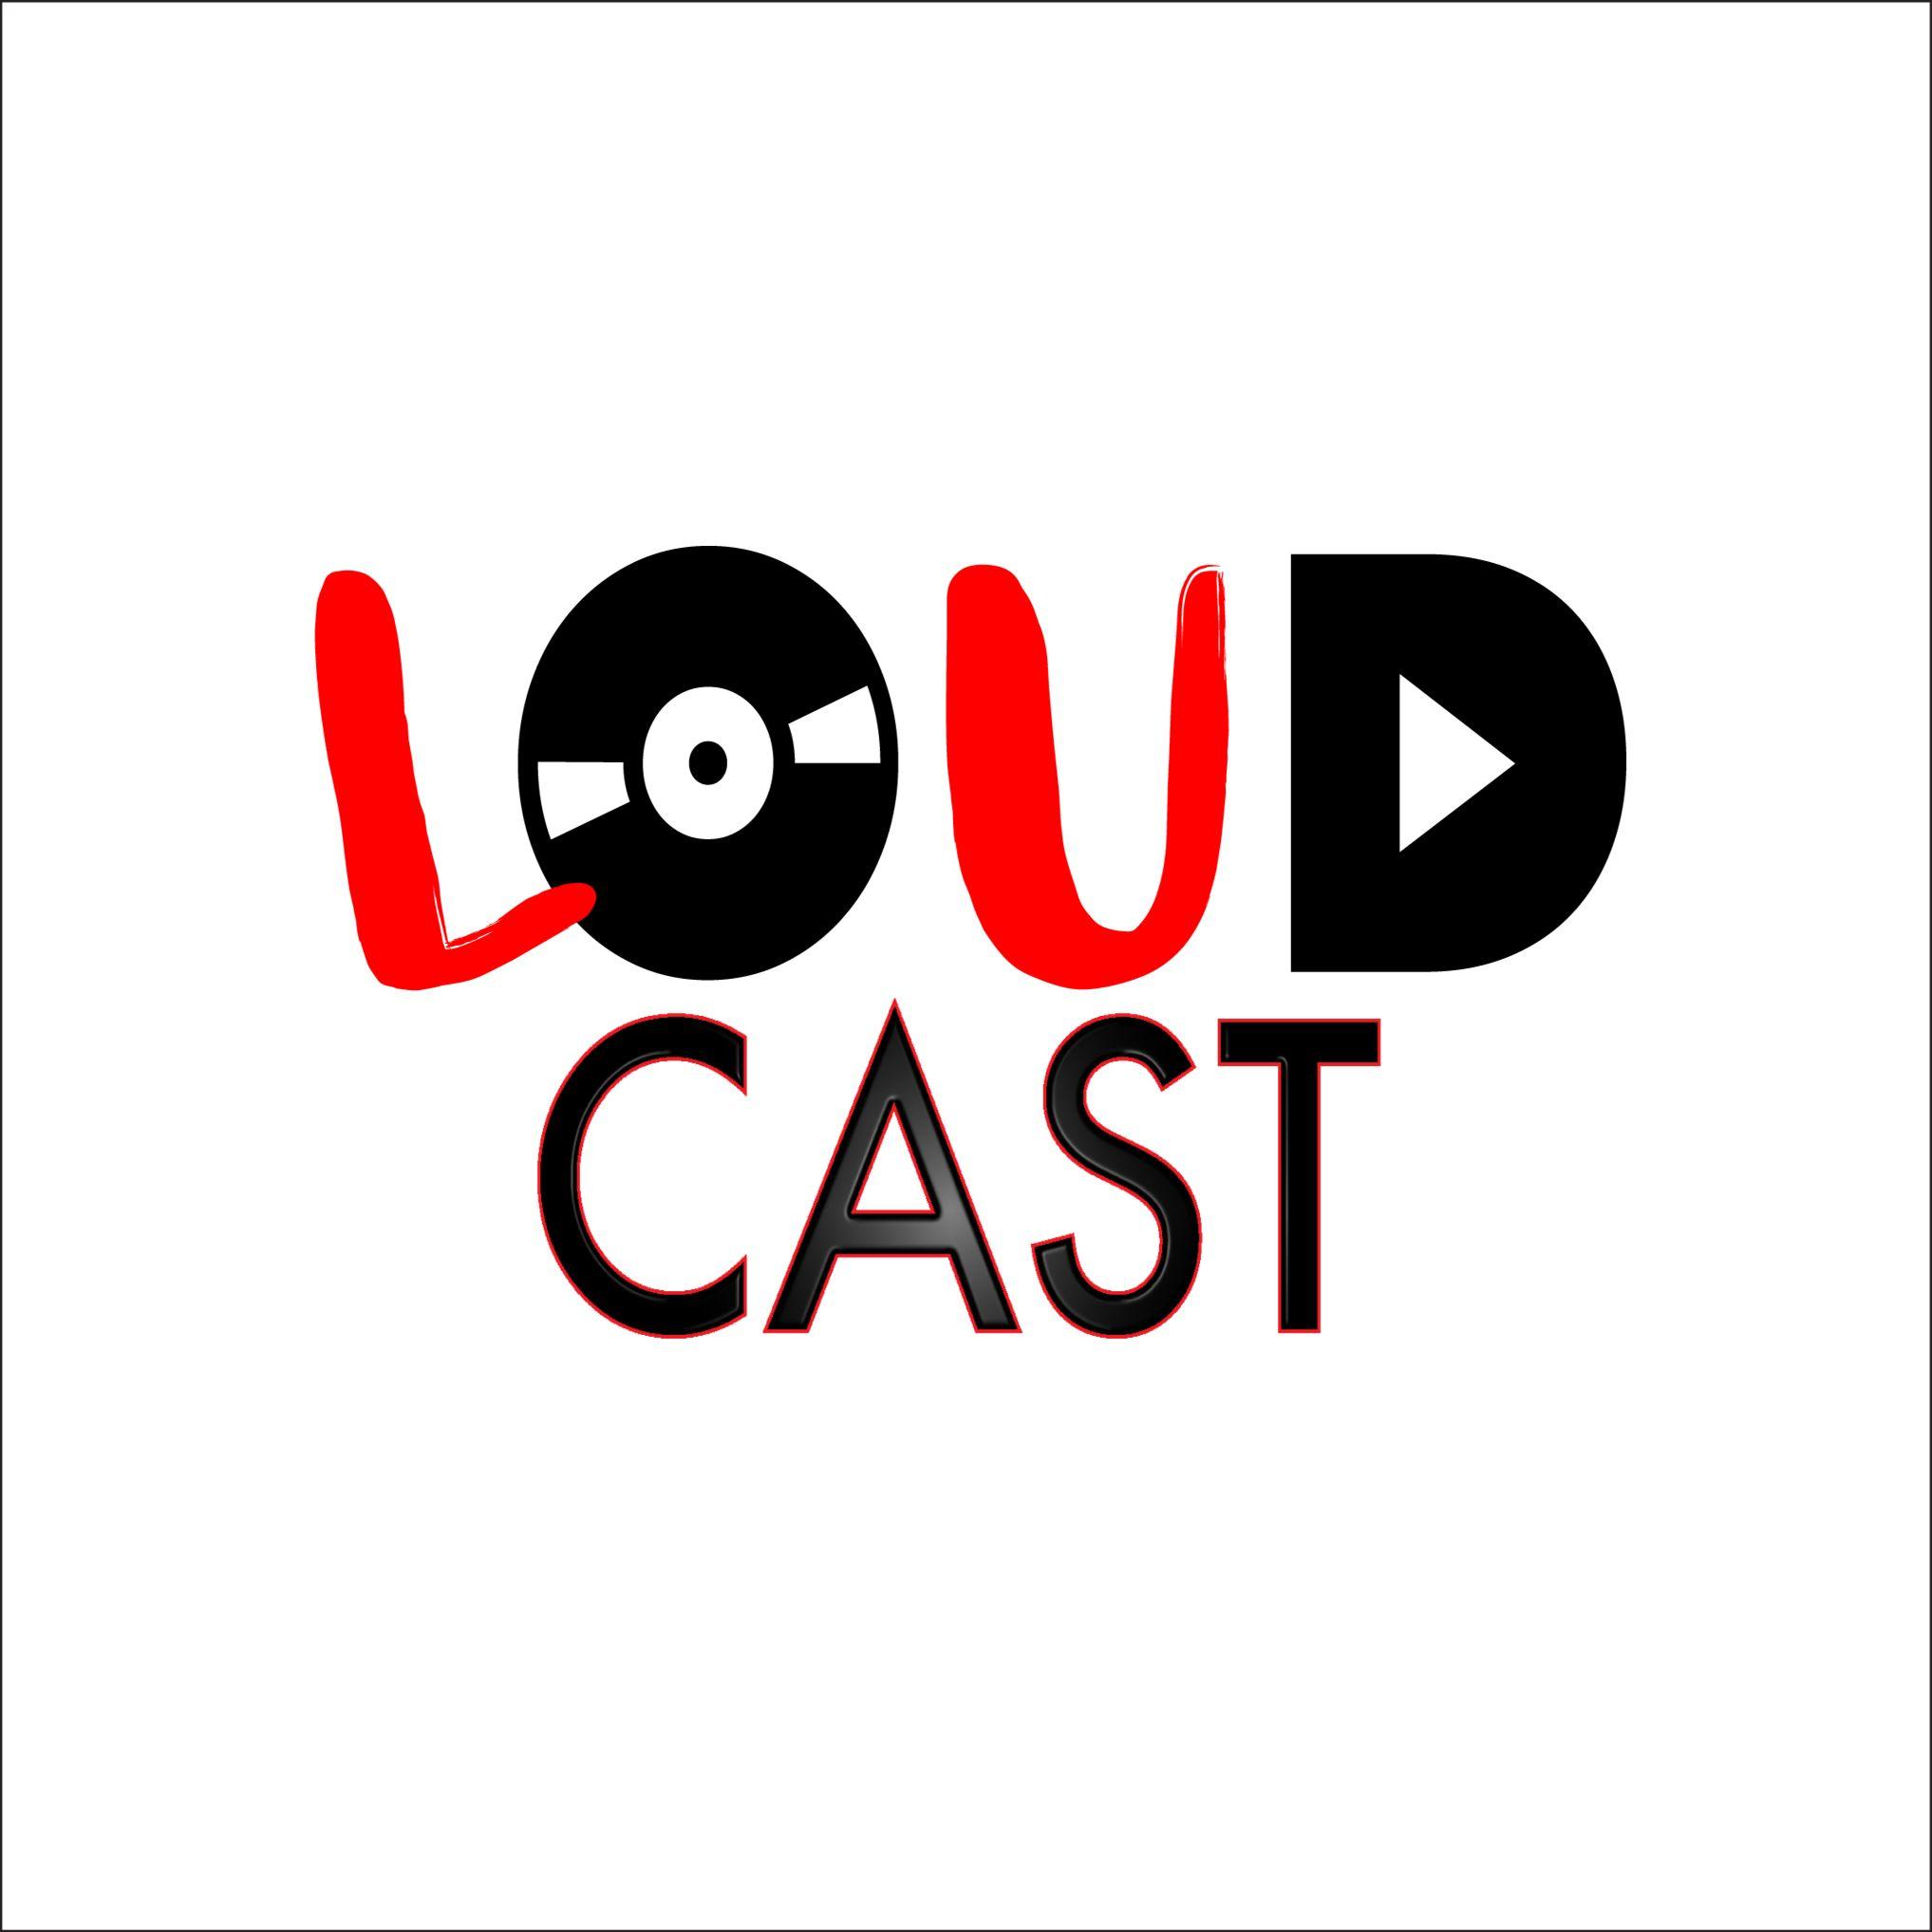 LOUDcast